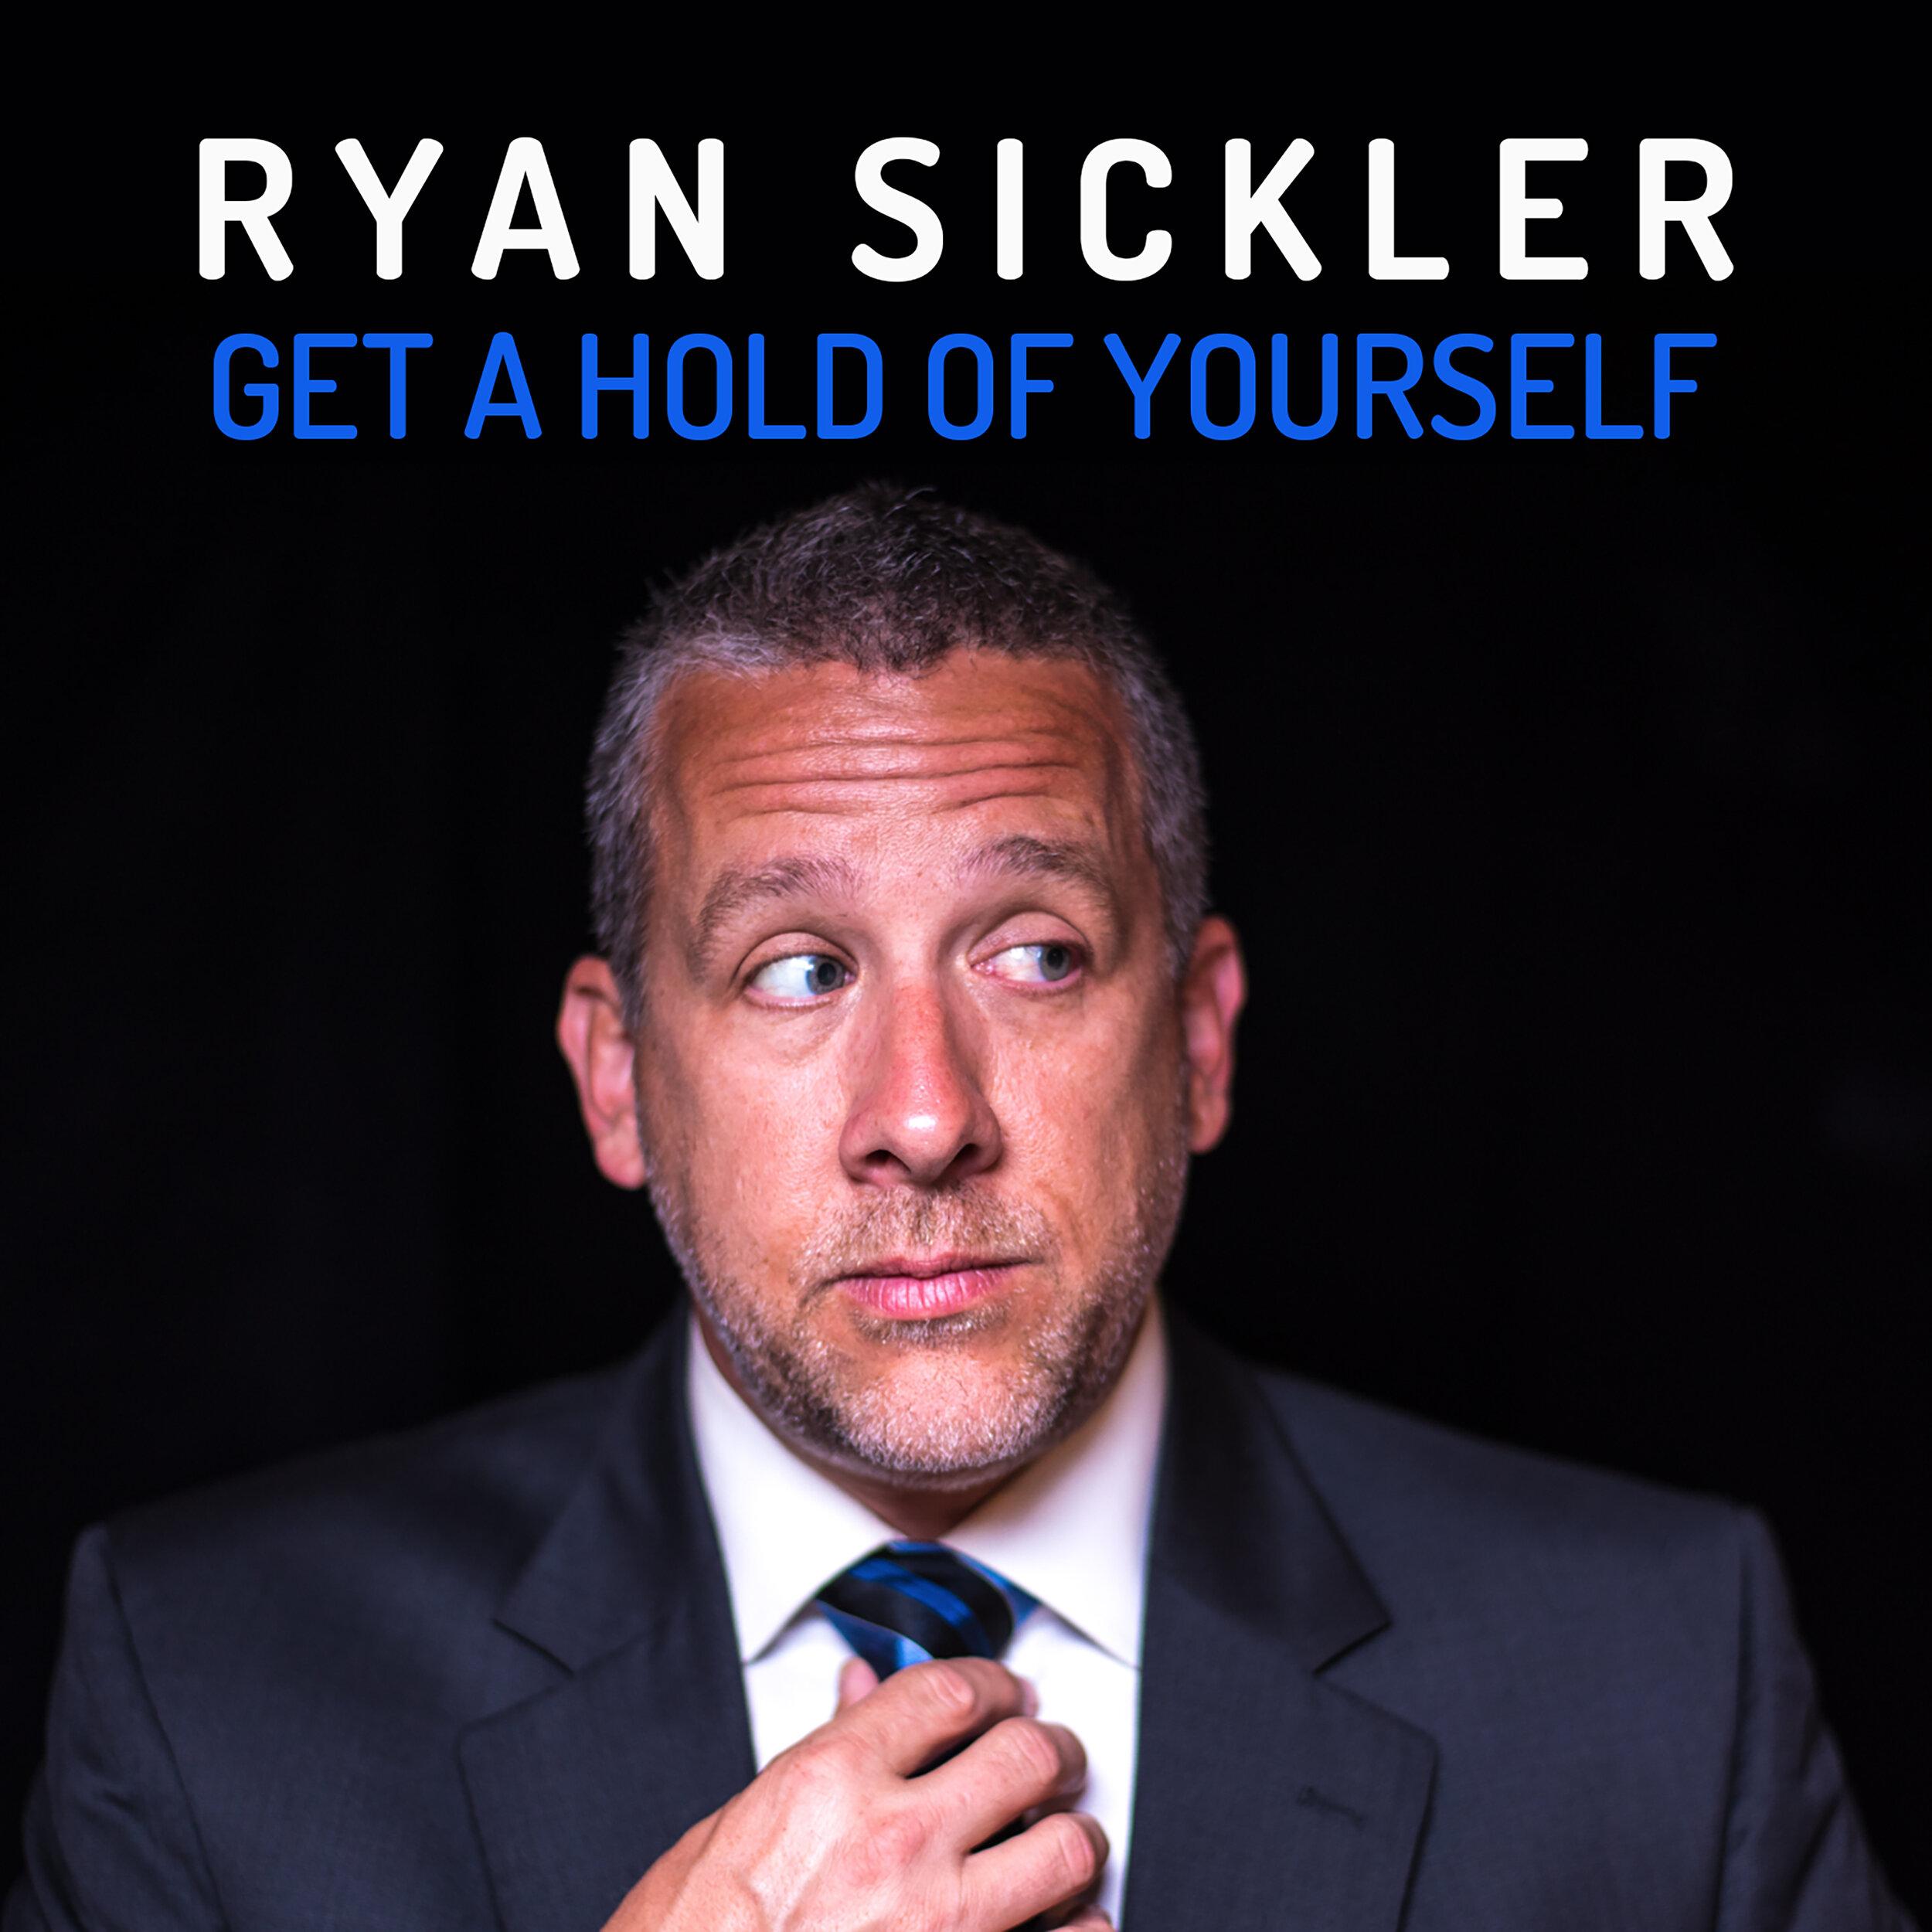 Ryan Sickler - Get a Hold of Yourself - Album Cover (digital) 2.jpg